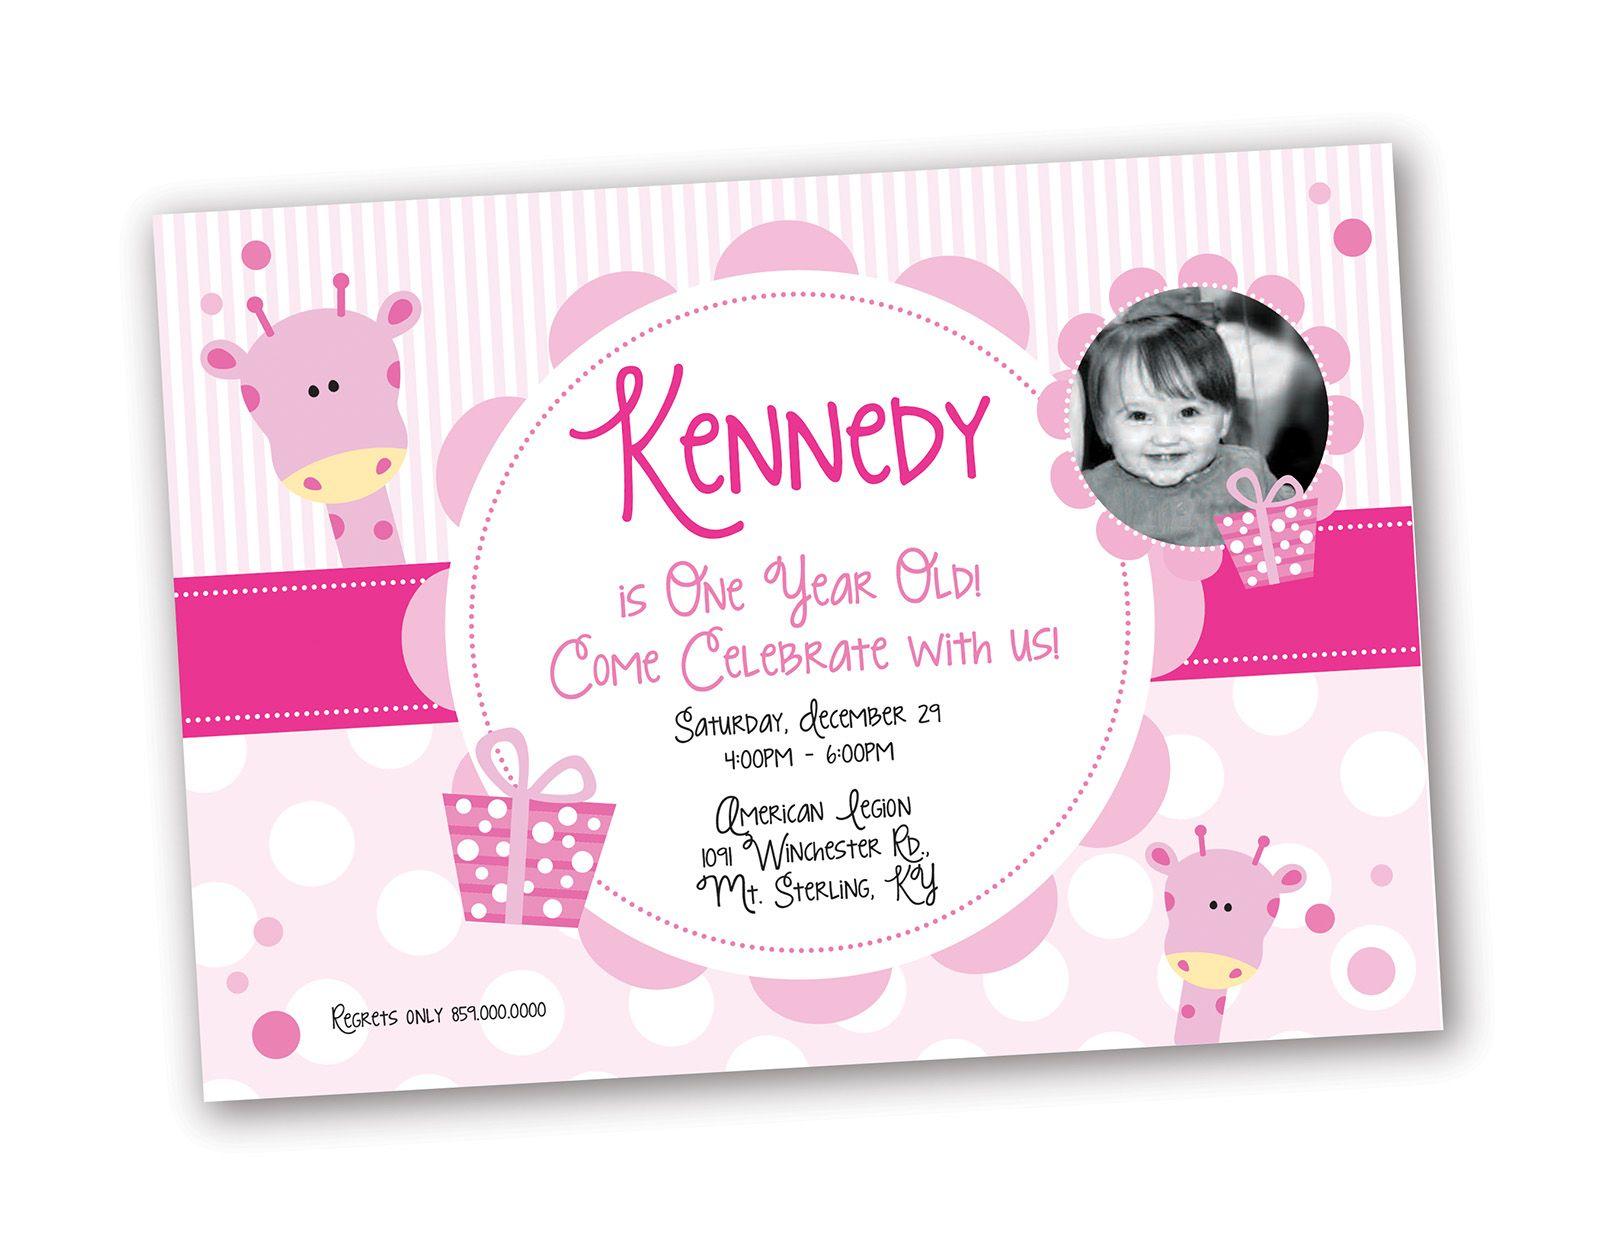 1 Year Old Girl Birthday Invitation Giraffe Theme Design